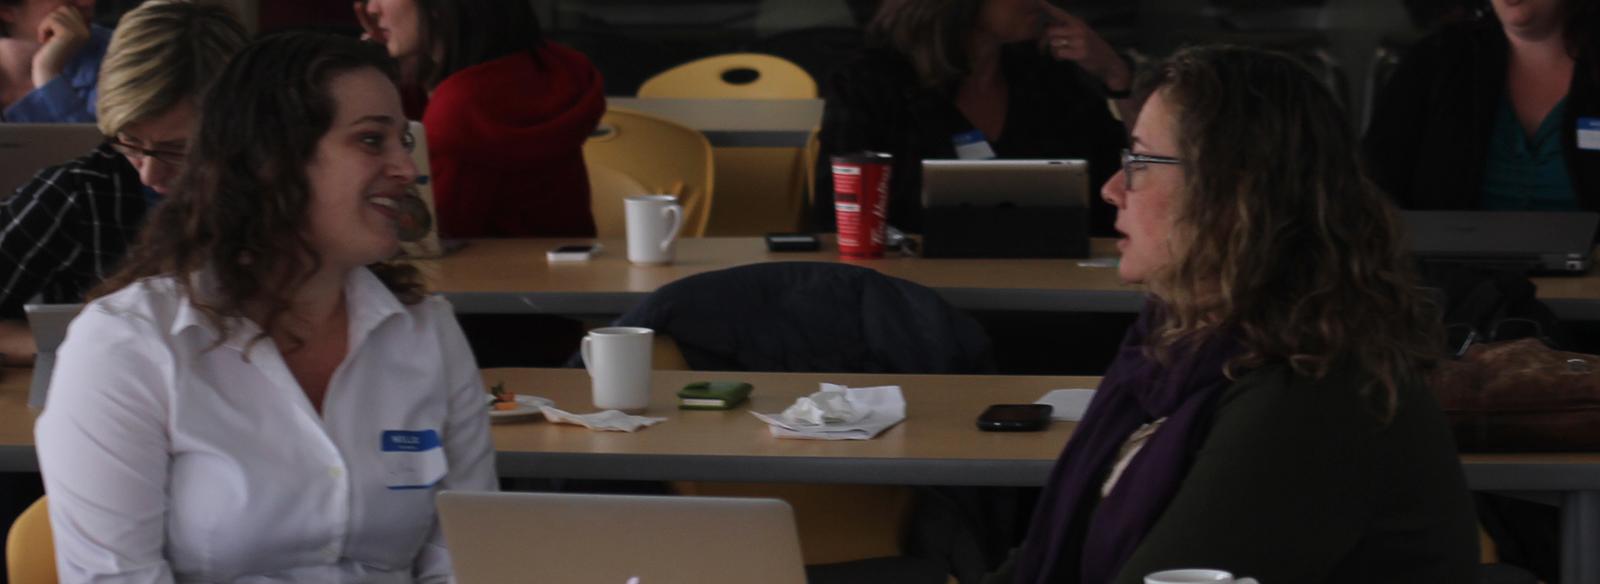 two women with name tags speaking to eachotherdeux femmes avec des étiquettes qui se parlent